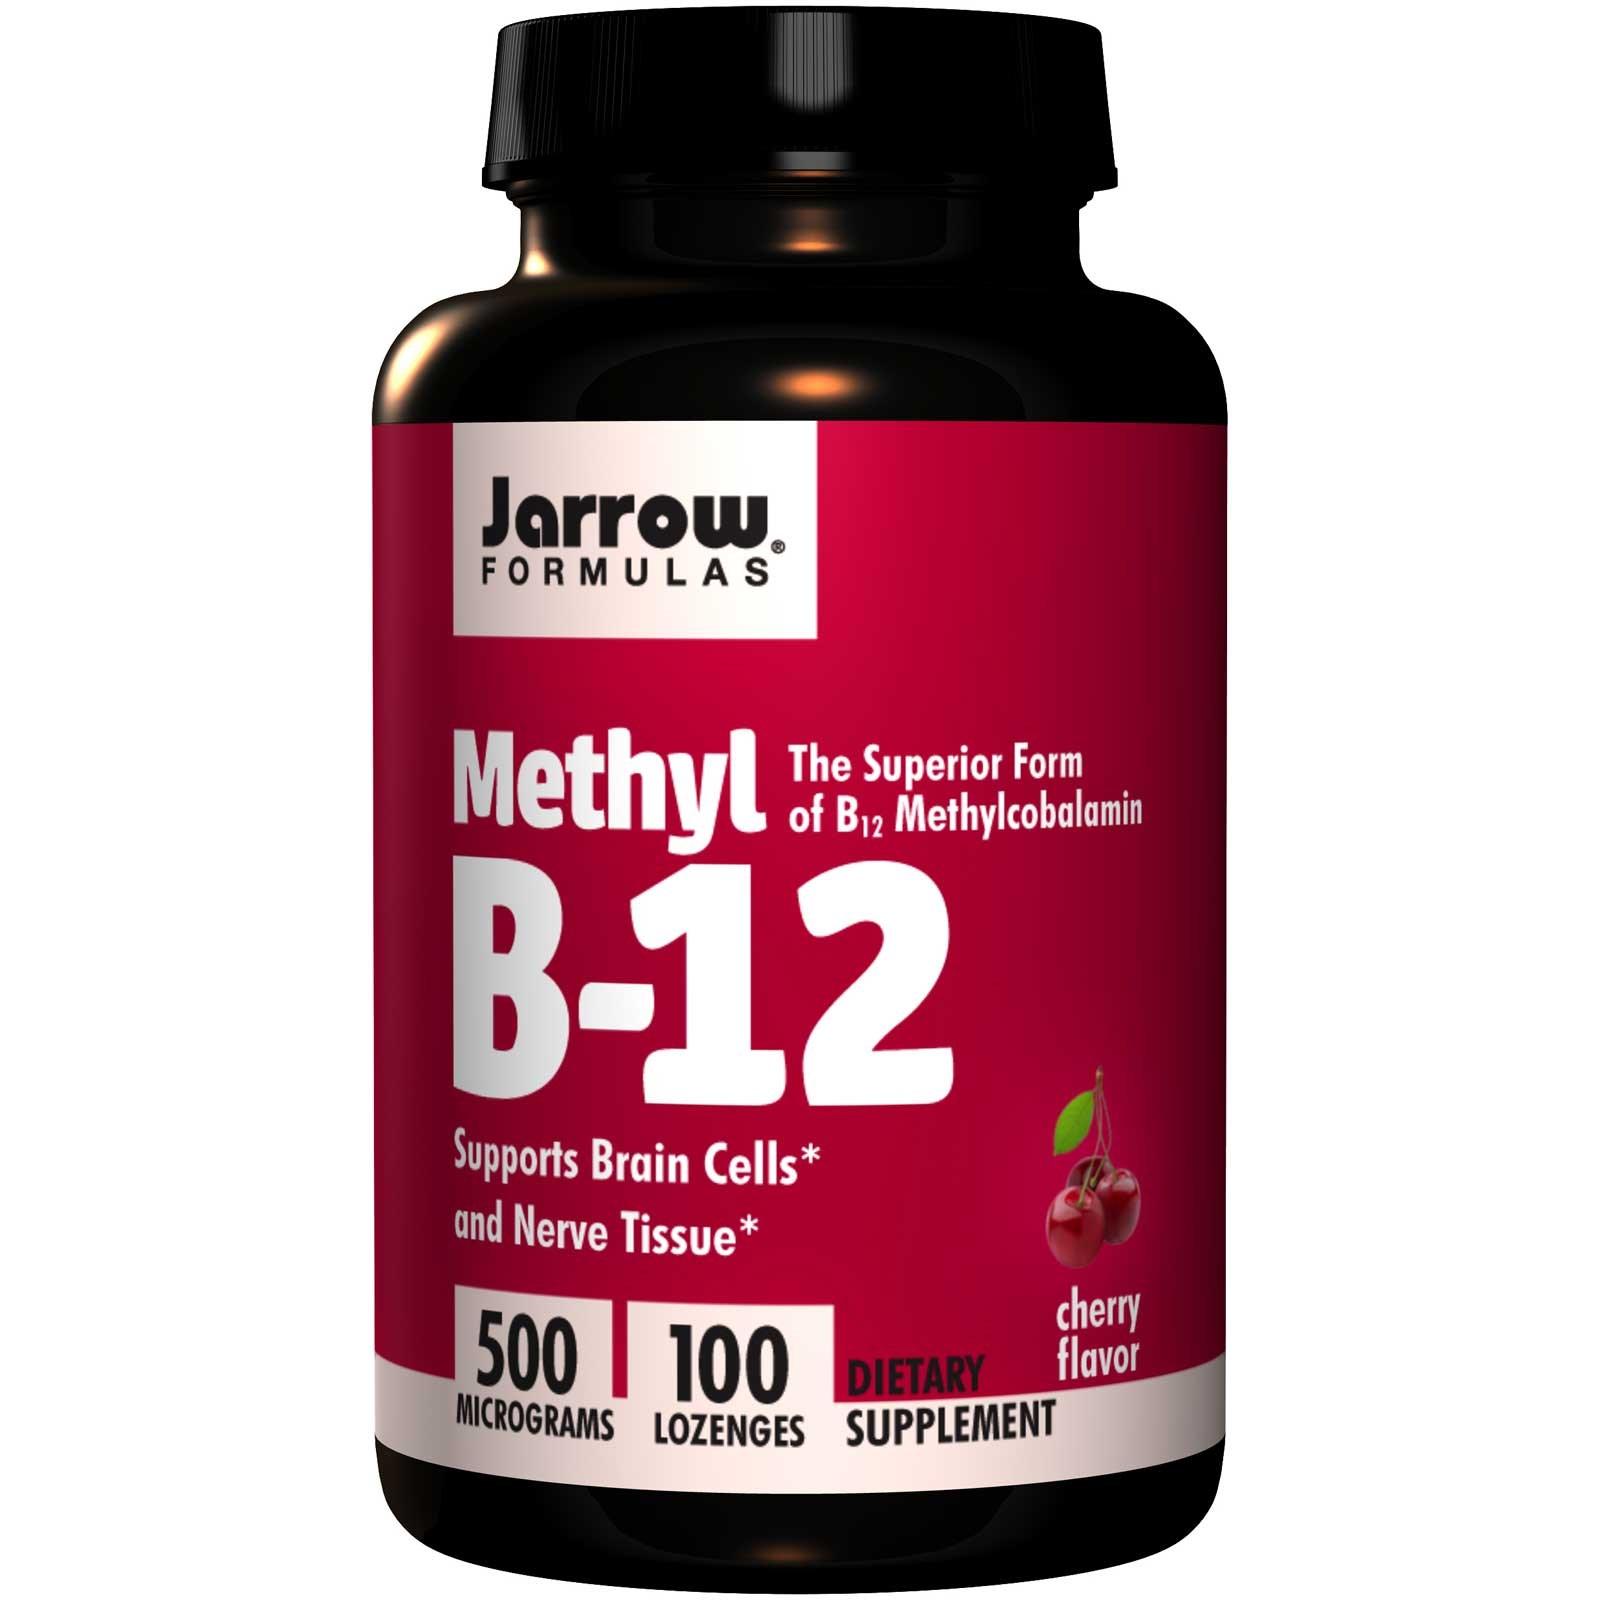 Image of Methyl B-12 Cherry Flavor 500 mcg (100 Lozenges) - Jarrow Formulas 0790011180159